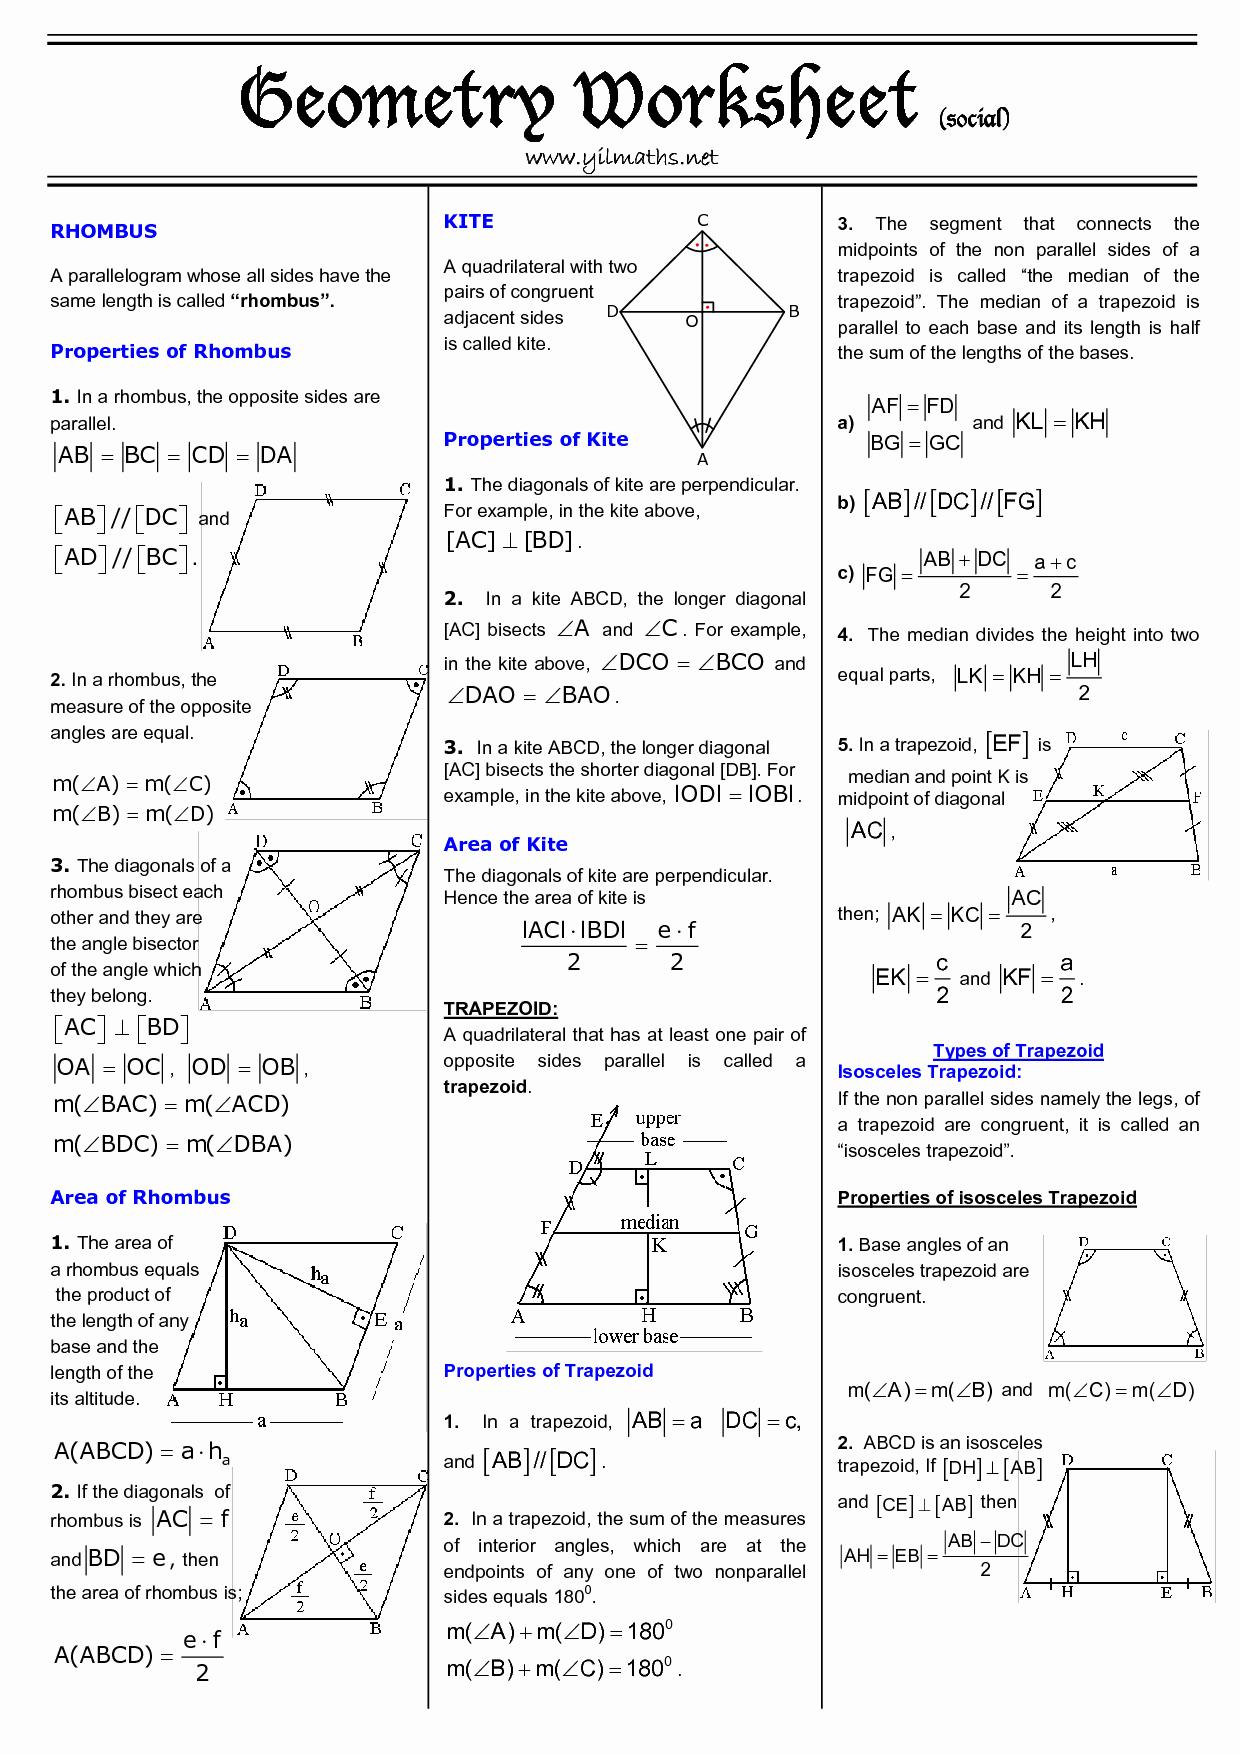 Geometry Worksheet Kites and Trapezoids Elegant Trapezoids and Kites Worksheet